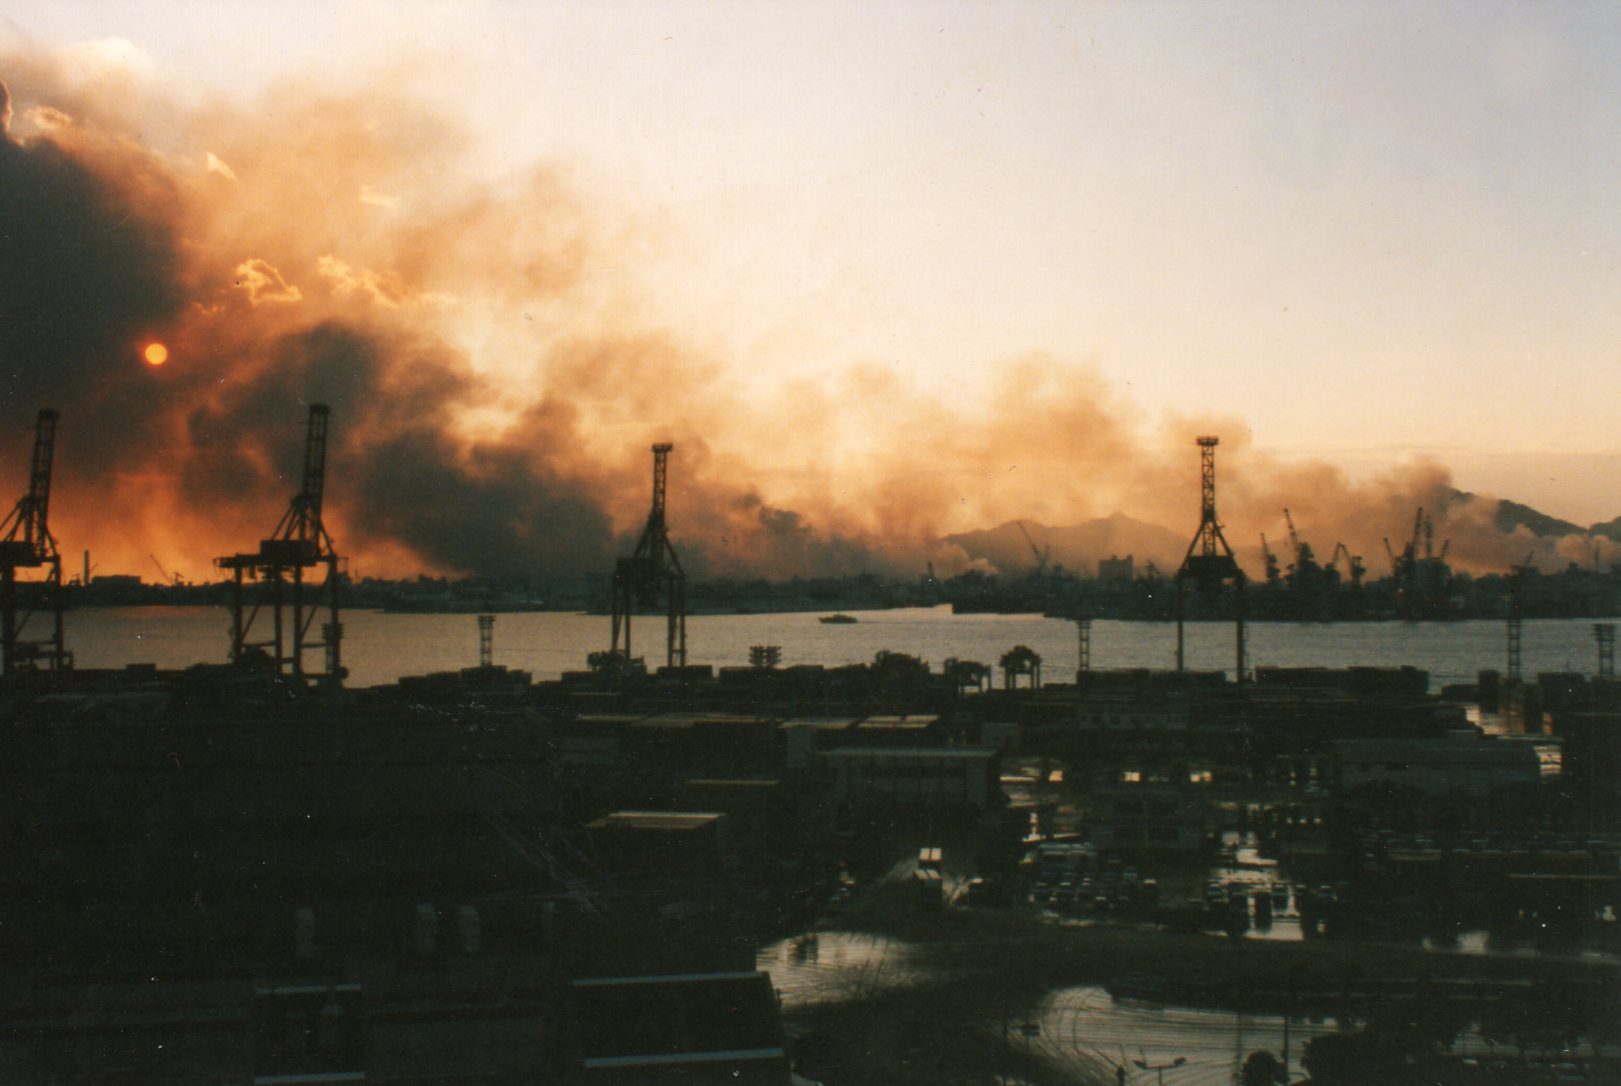 https://upload.wikimedia.org/wikipedia/commons/e/ef/Fire_of_Great_Hanshin_earthquake_Seen_from_Portisland.jpg